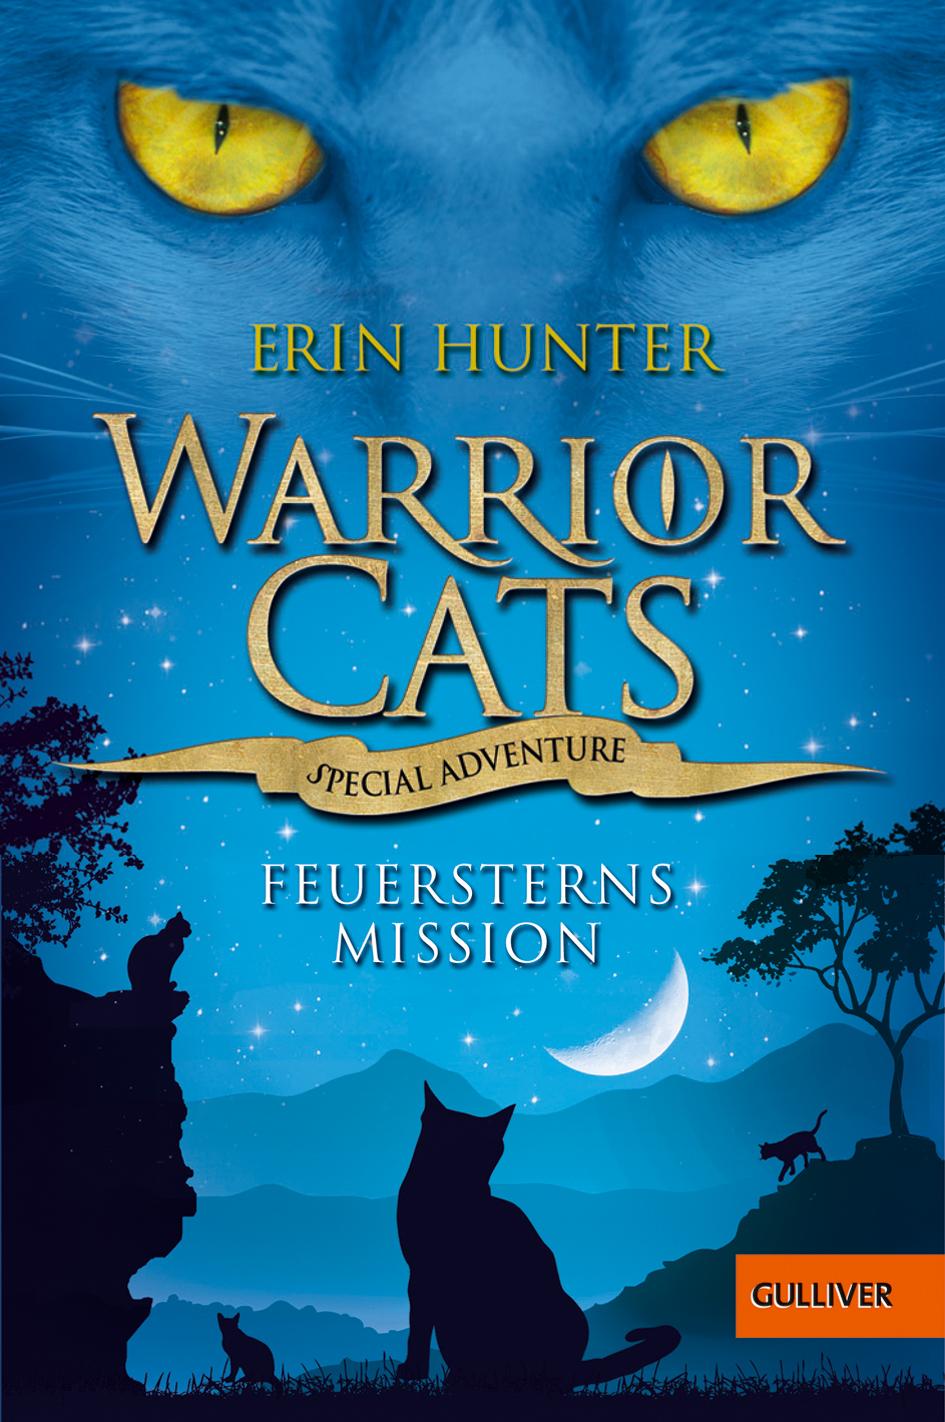 Warrior Cats Special Adventure